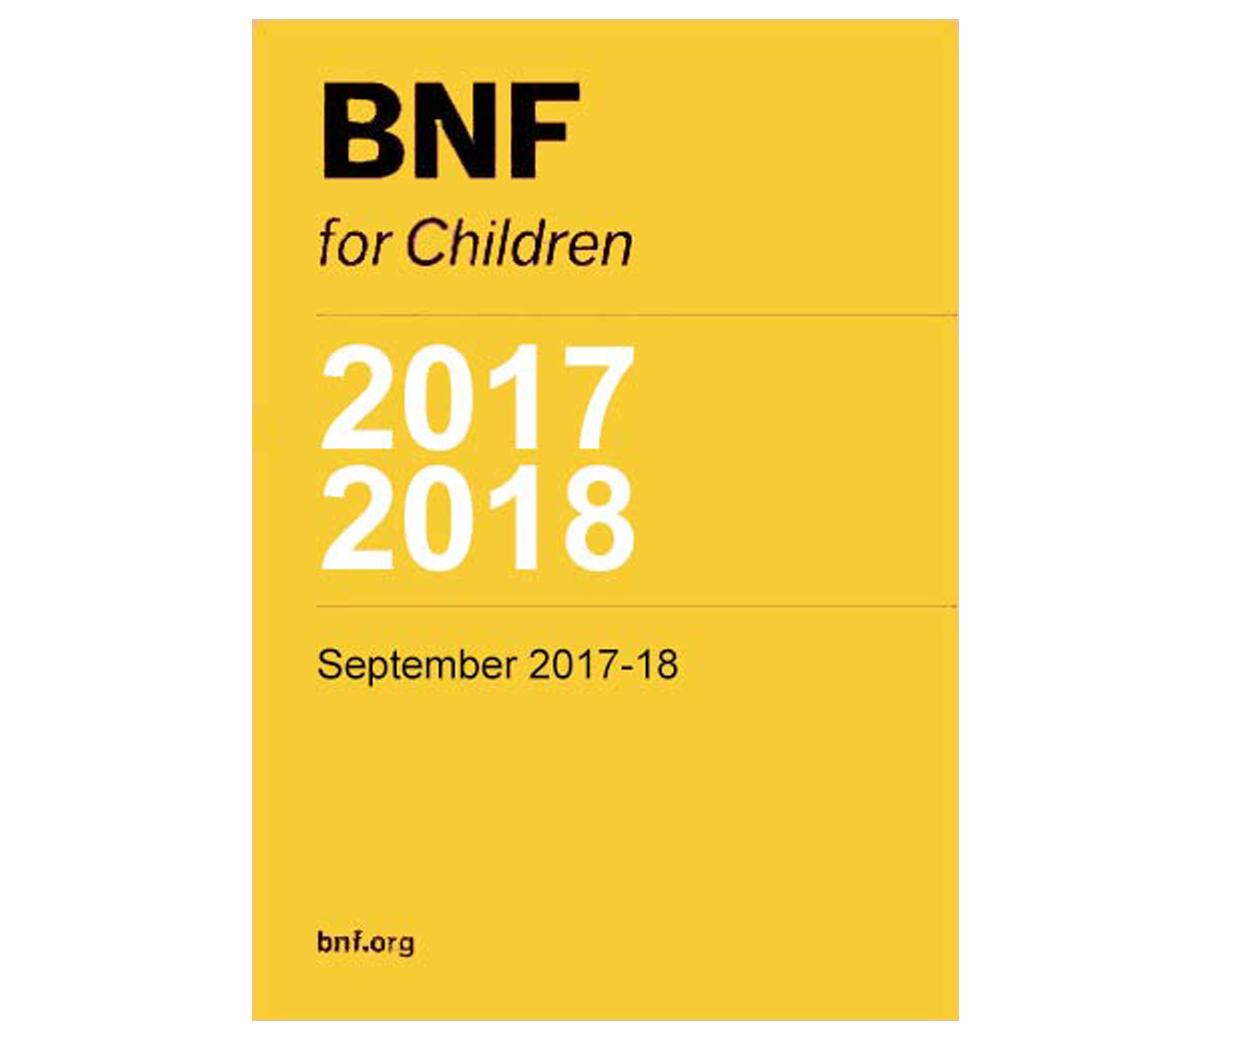 BNF for Children 2017-2018